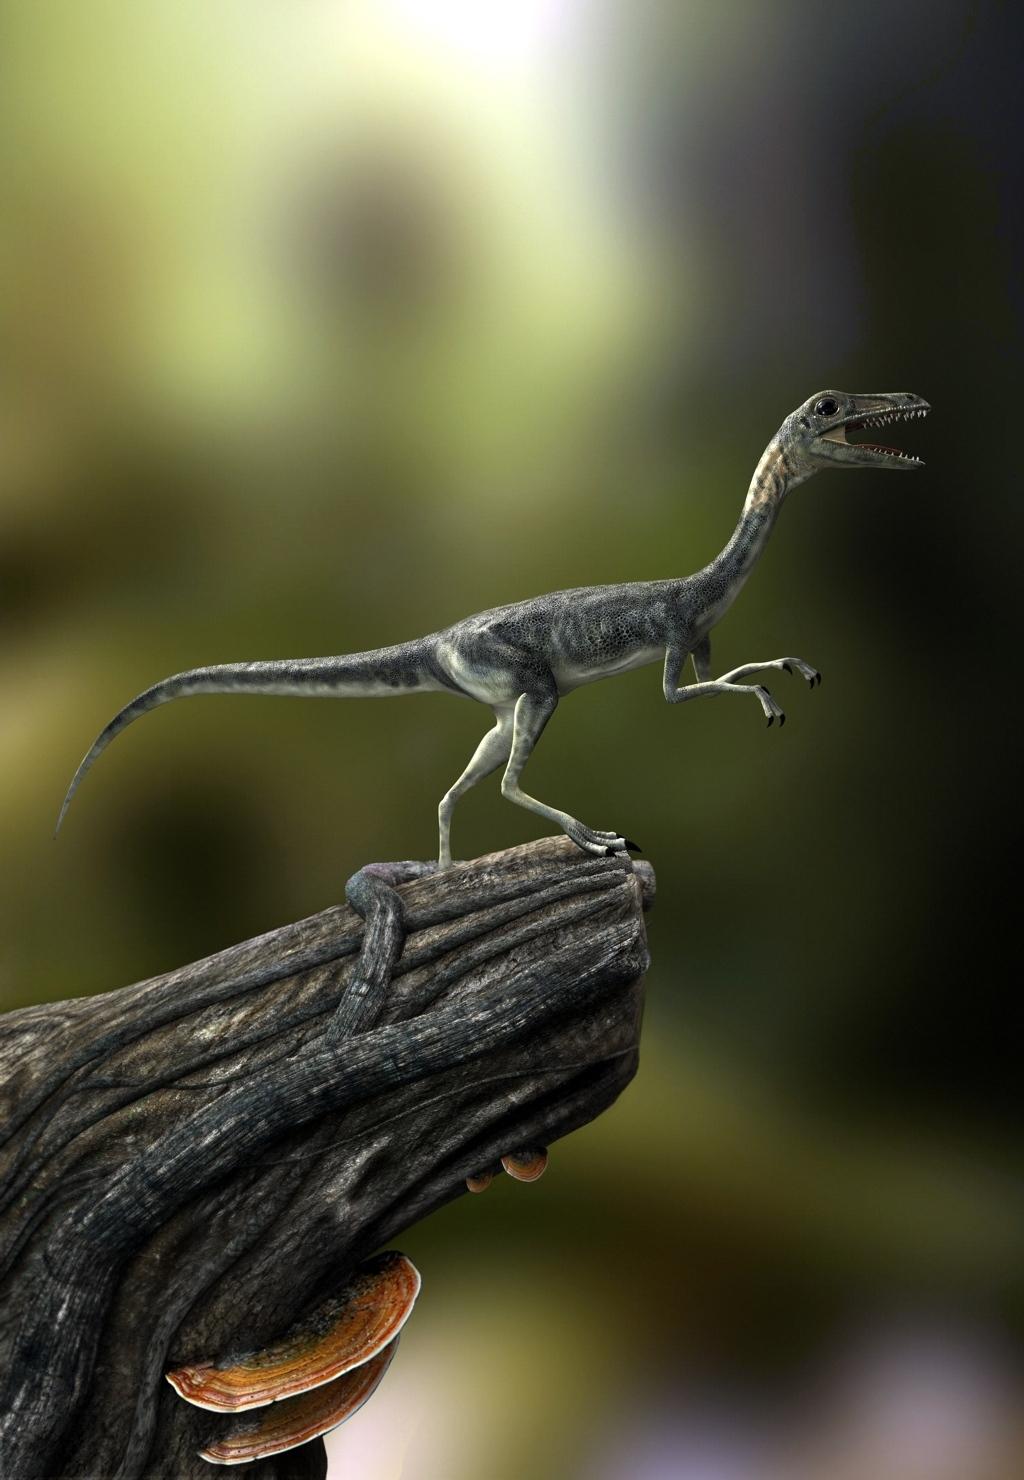 Hcosta compsognathus 1 ef4b0fb3 szi4